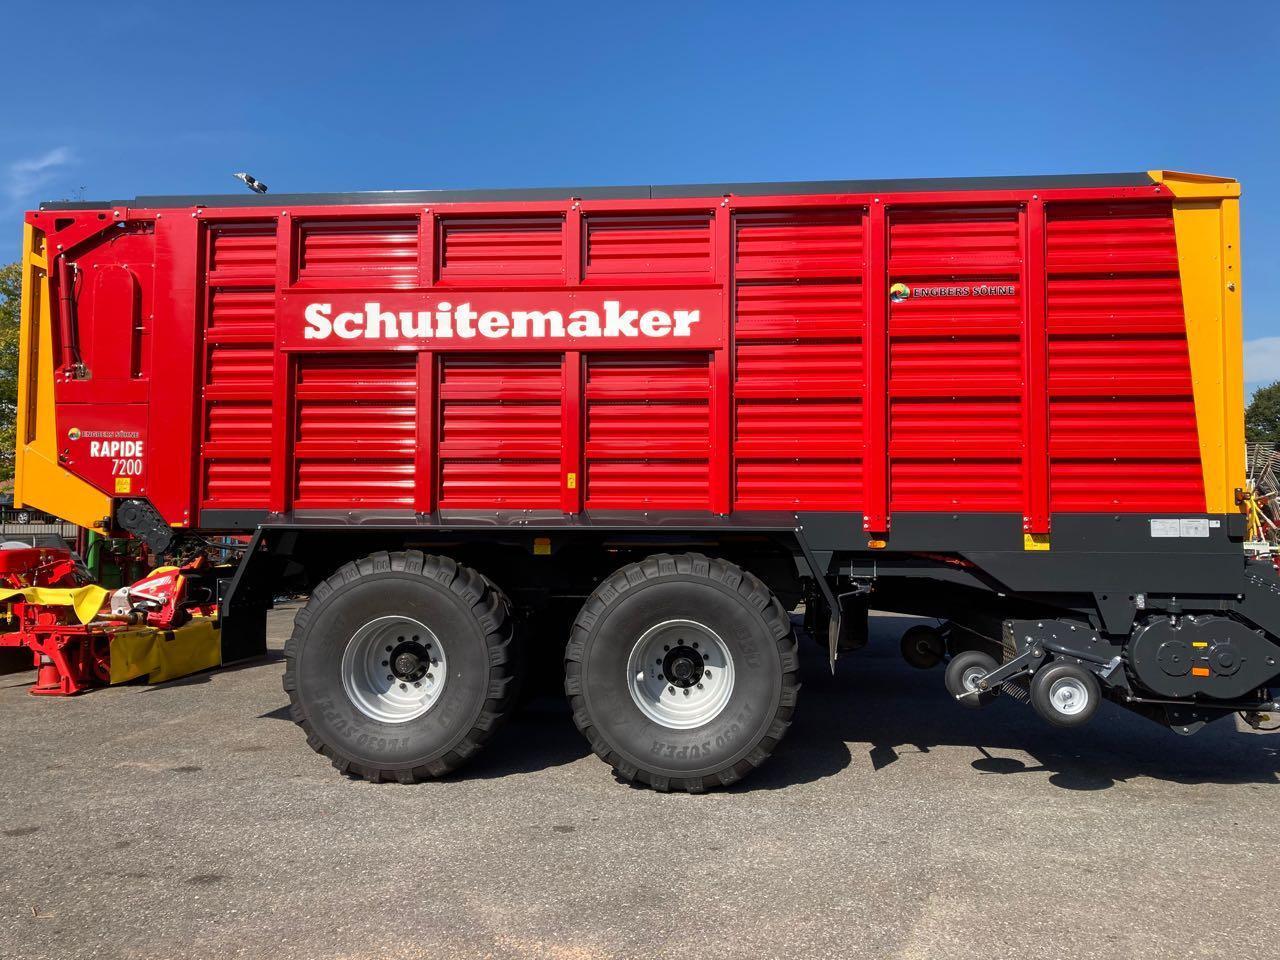 Schuitemaker SR Holland Rapide 7200 W